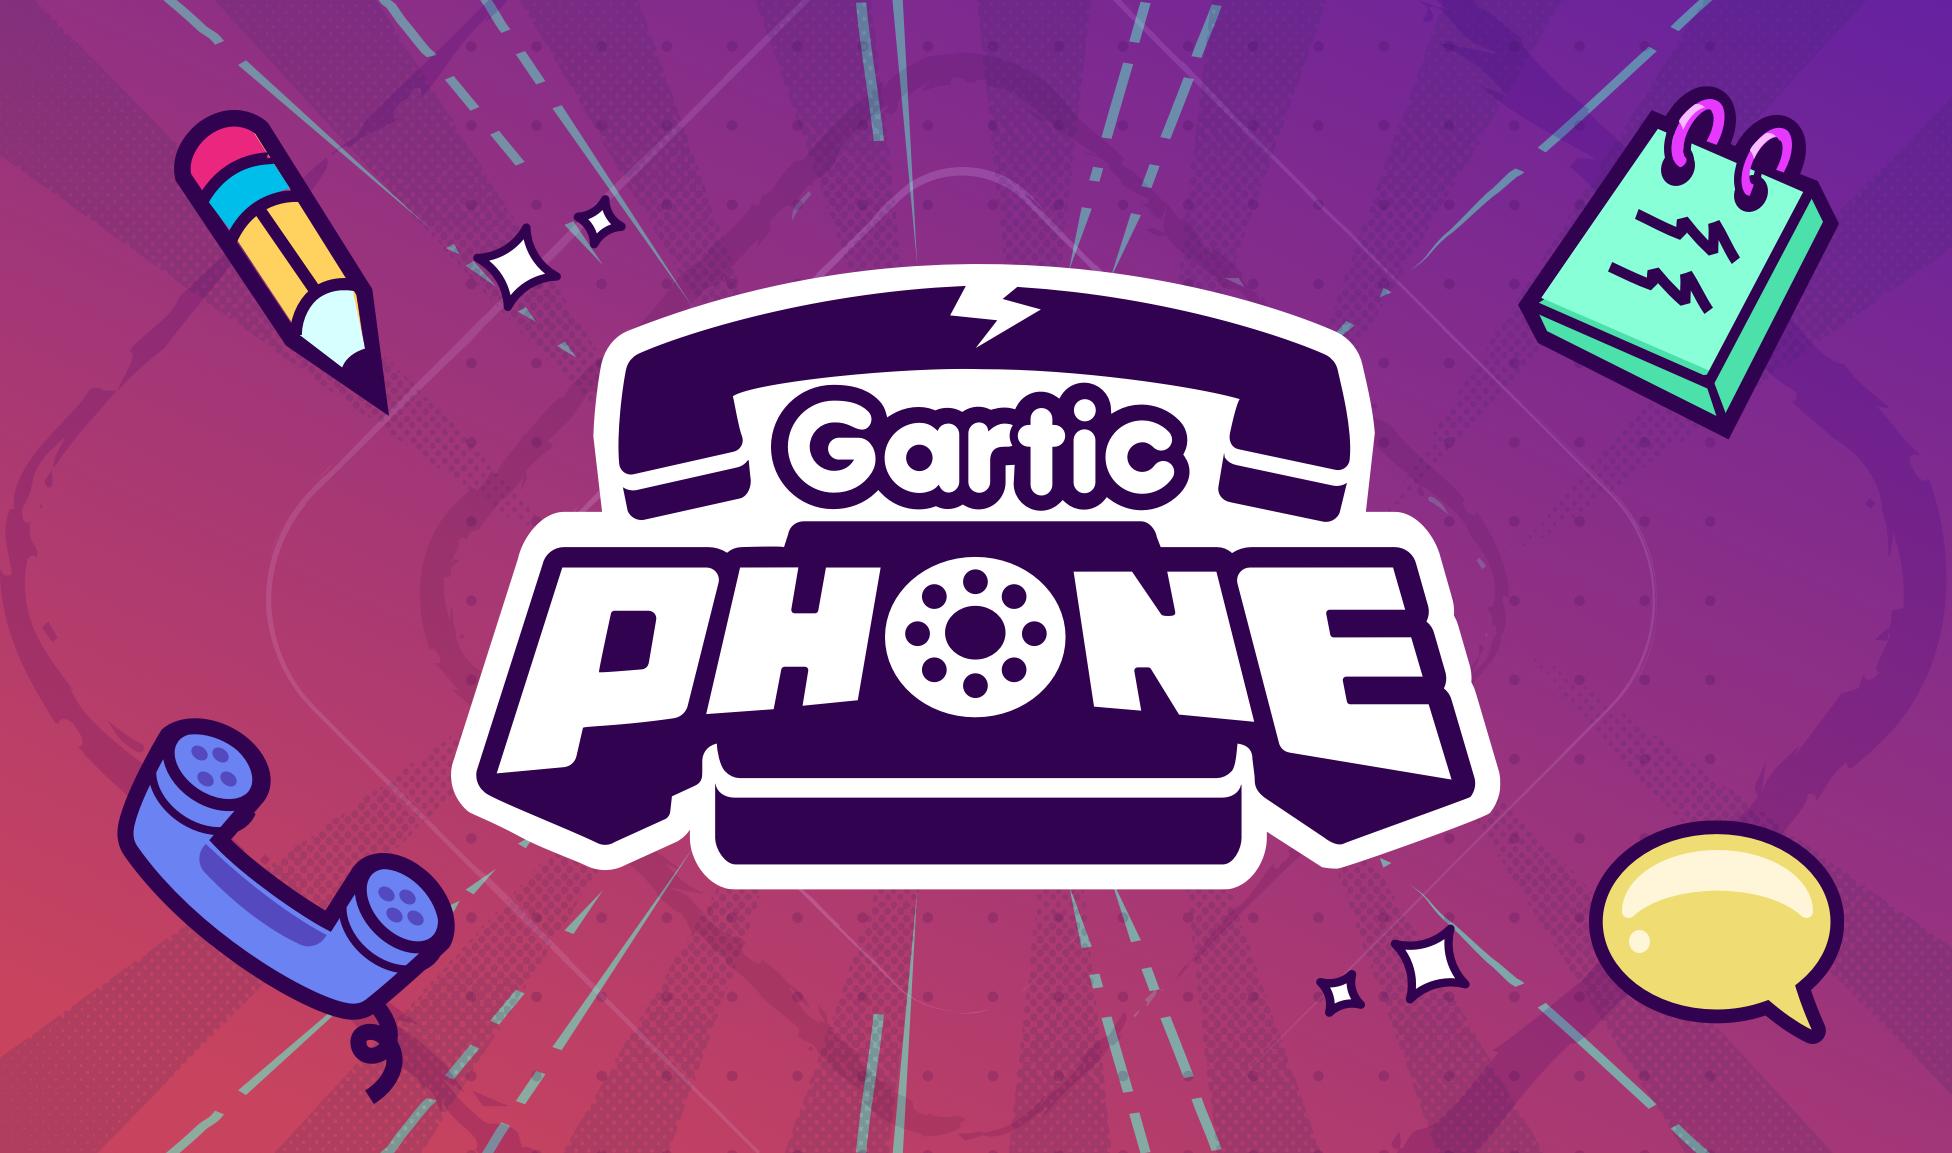 Gartic Phone - The Telephone Game